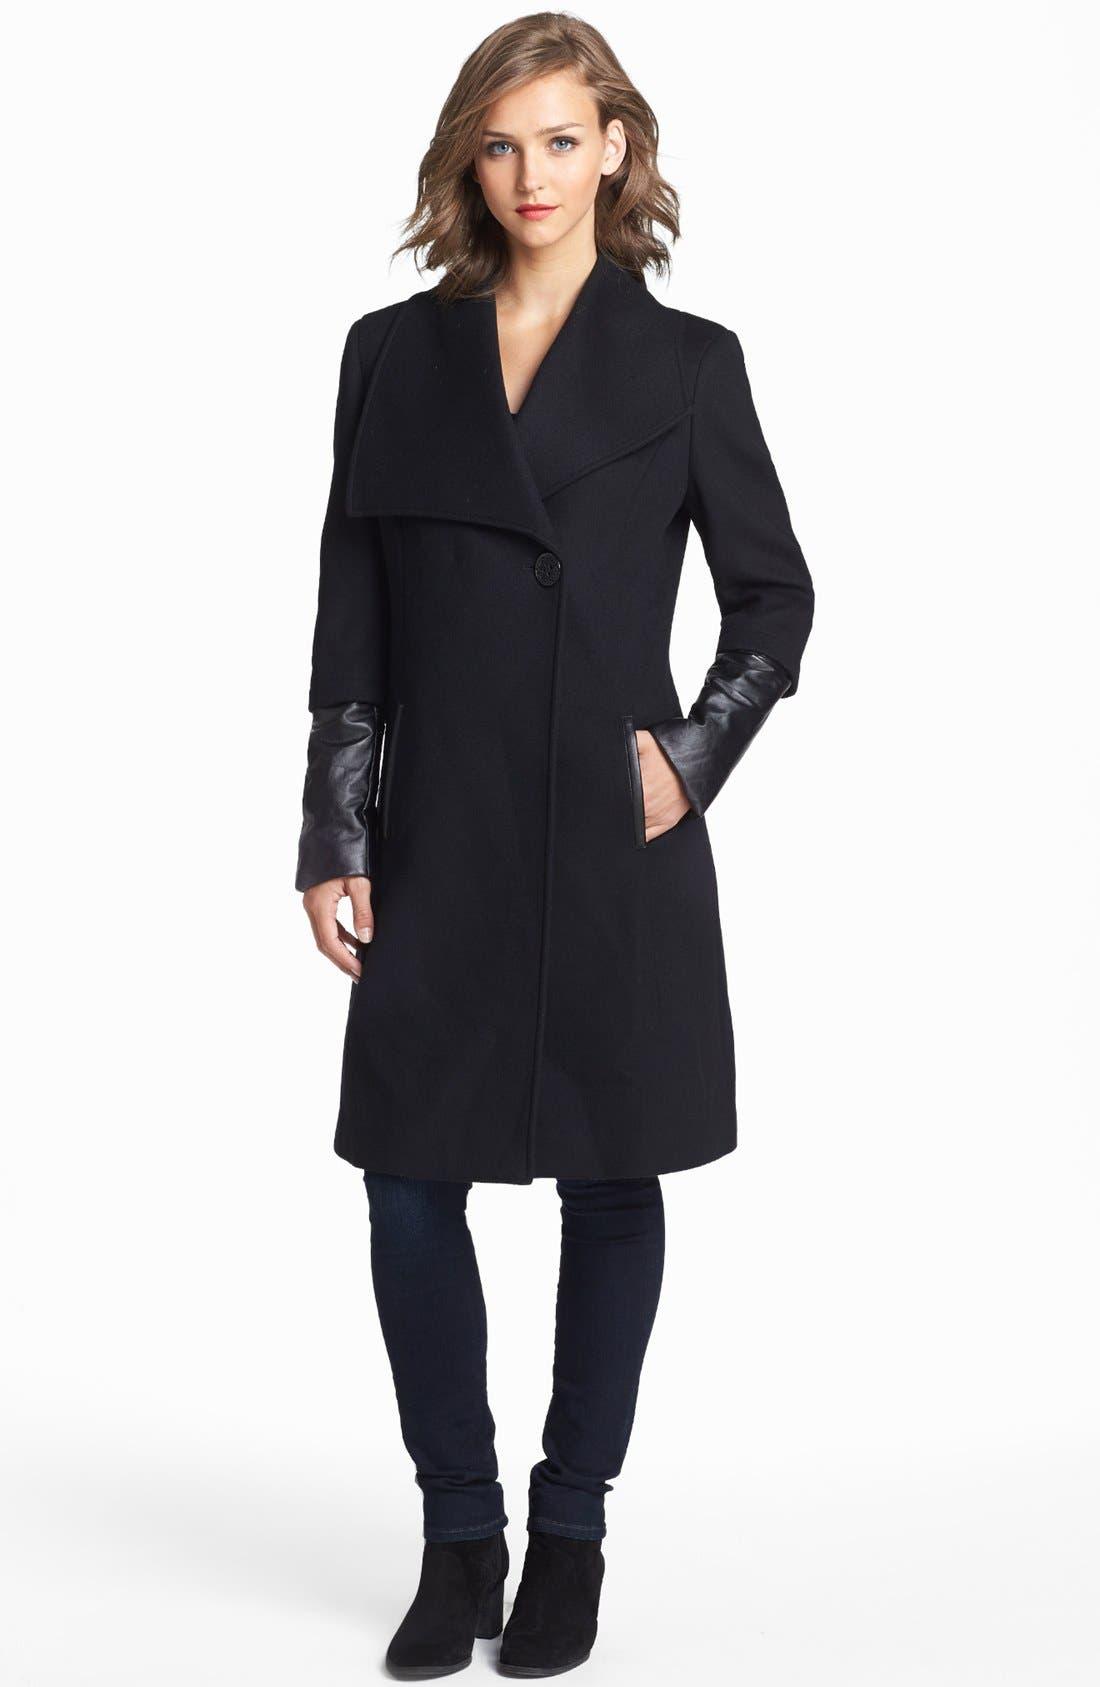 Alternate Image 1 Selected - Elie Tahari 'Carlotta' Leather Trim Wool Blend Coat